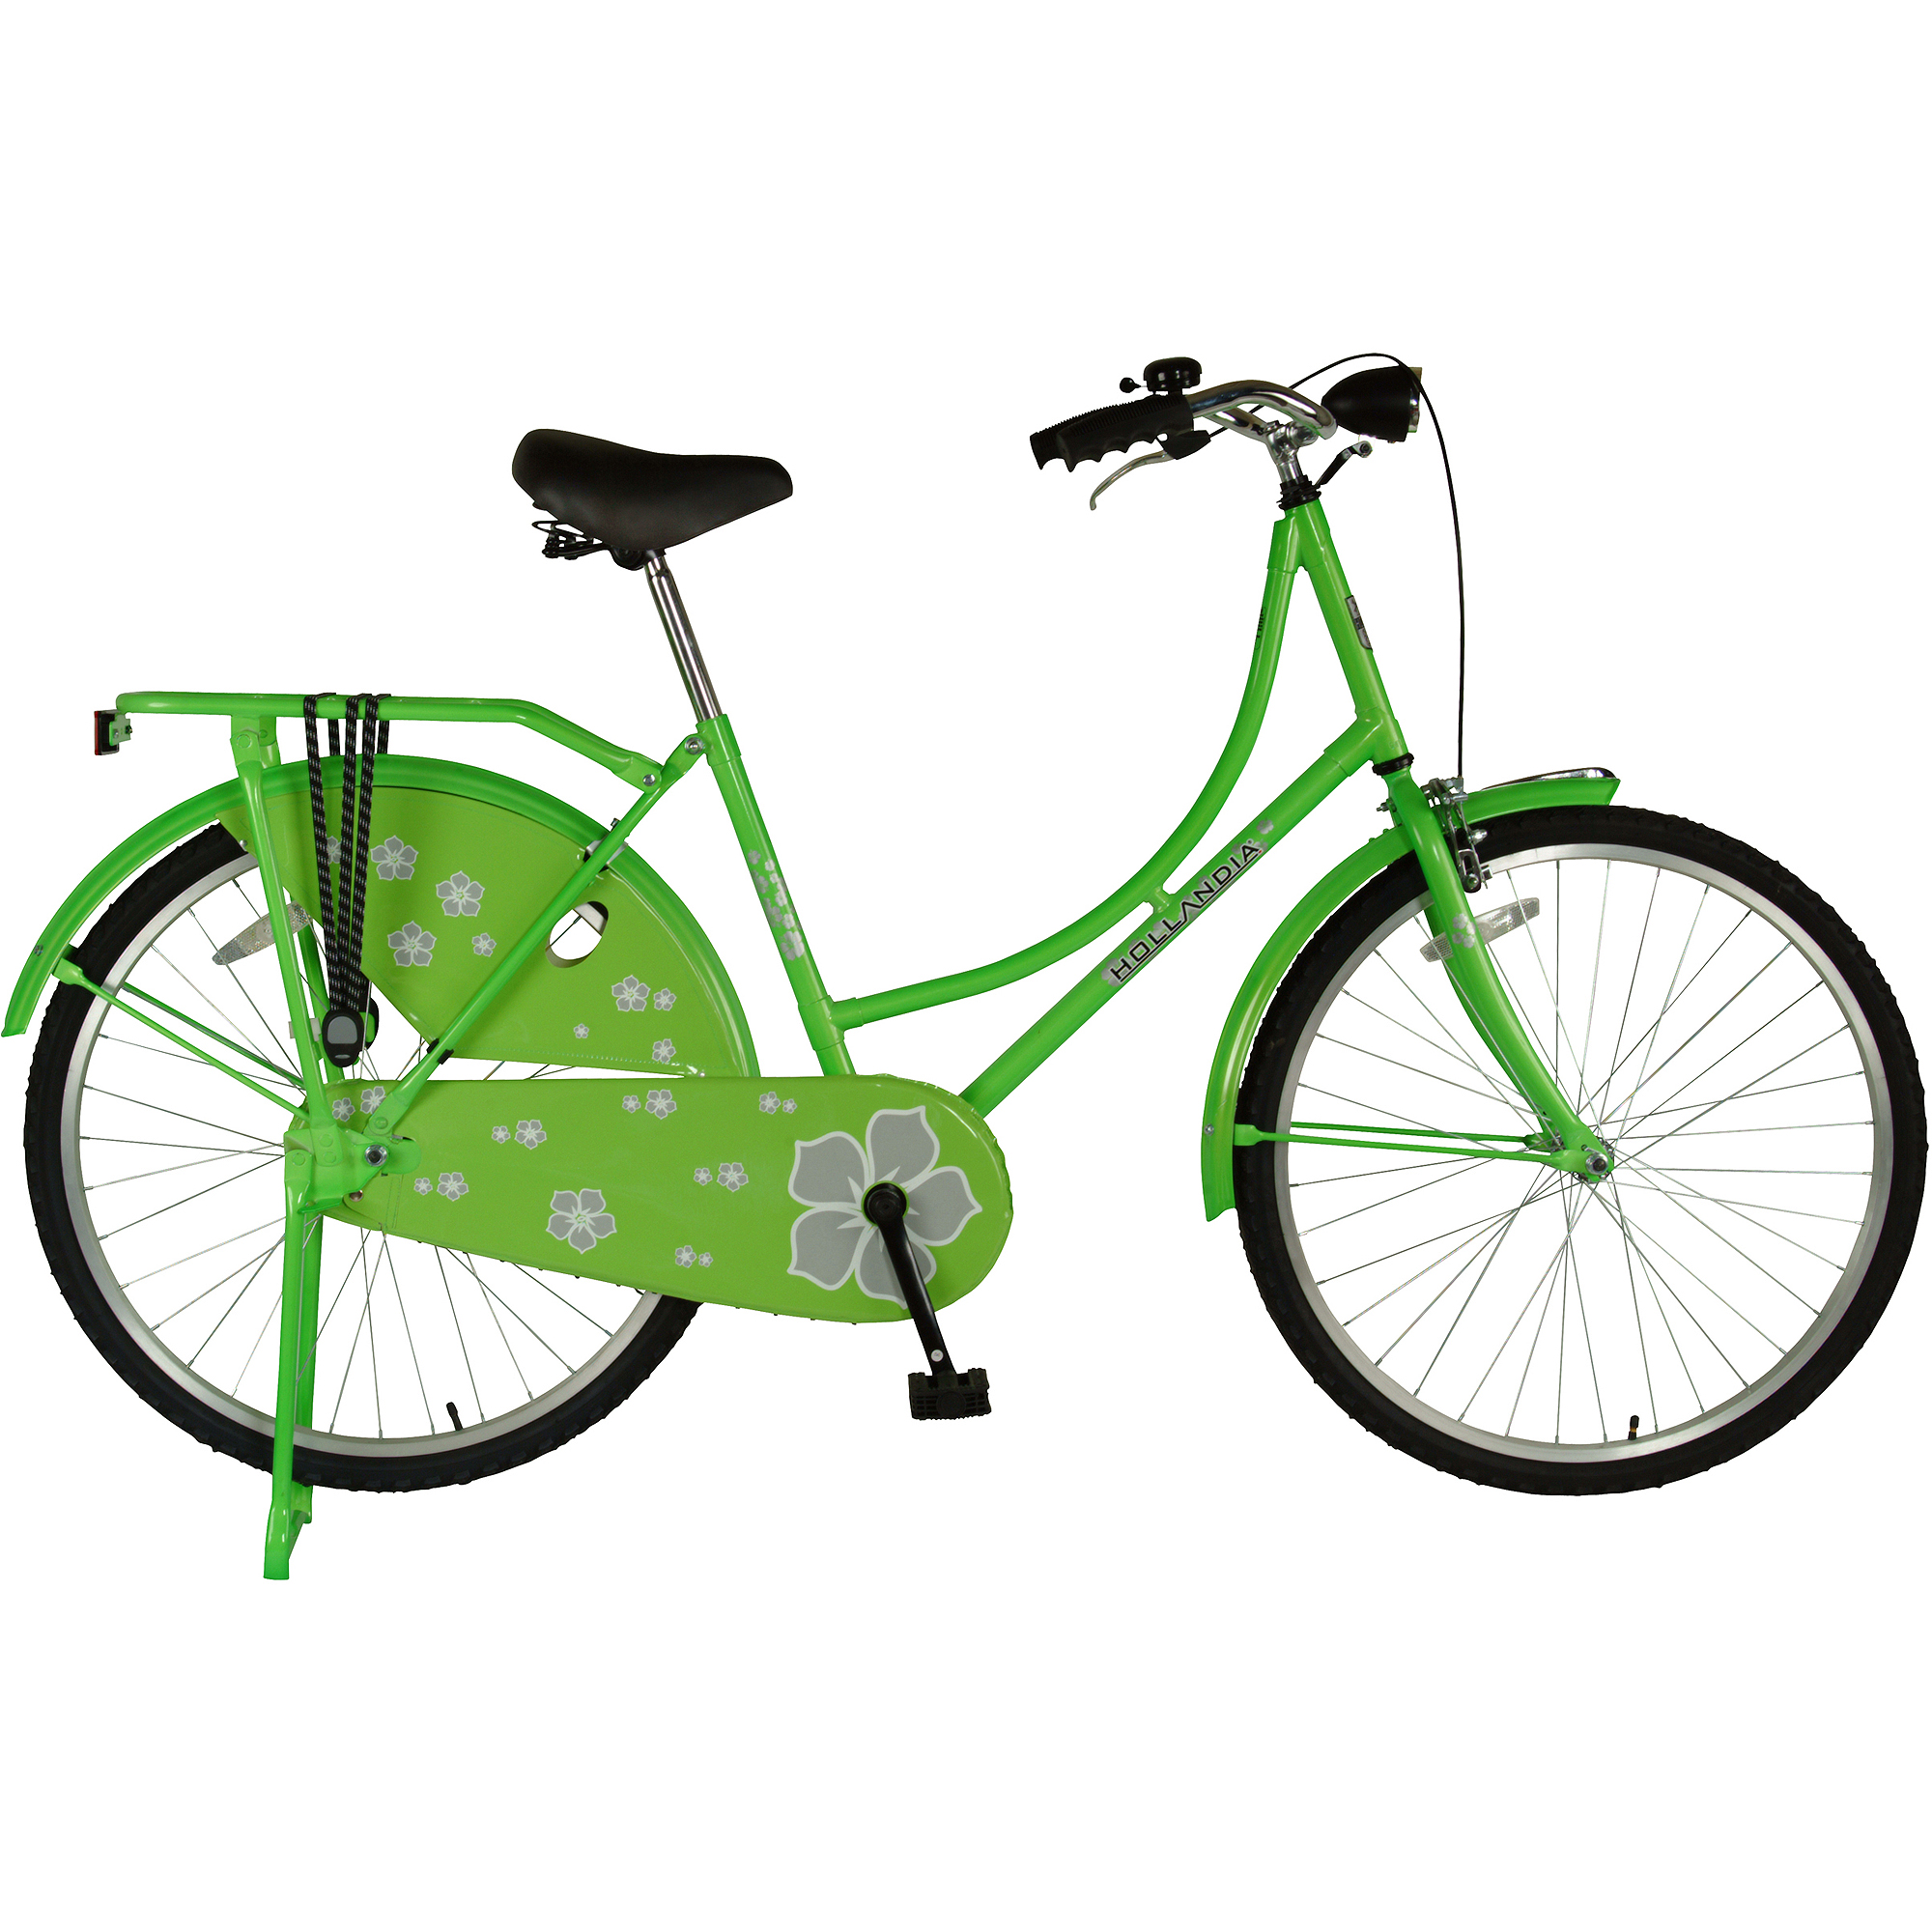 "26"" Hollandia New Oma Cruiser Bike"